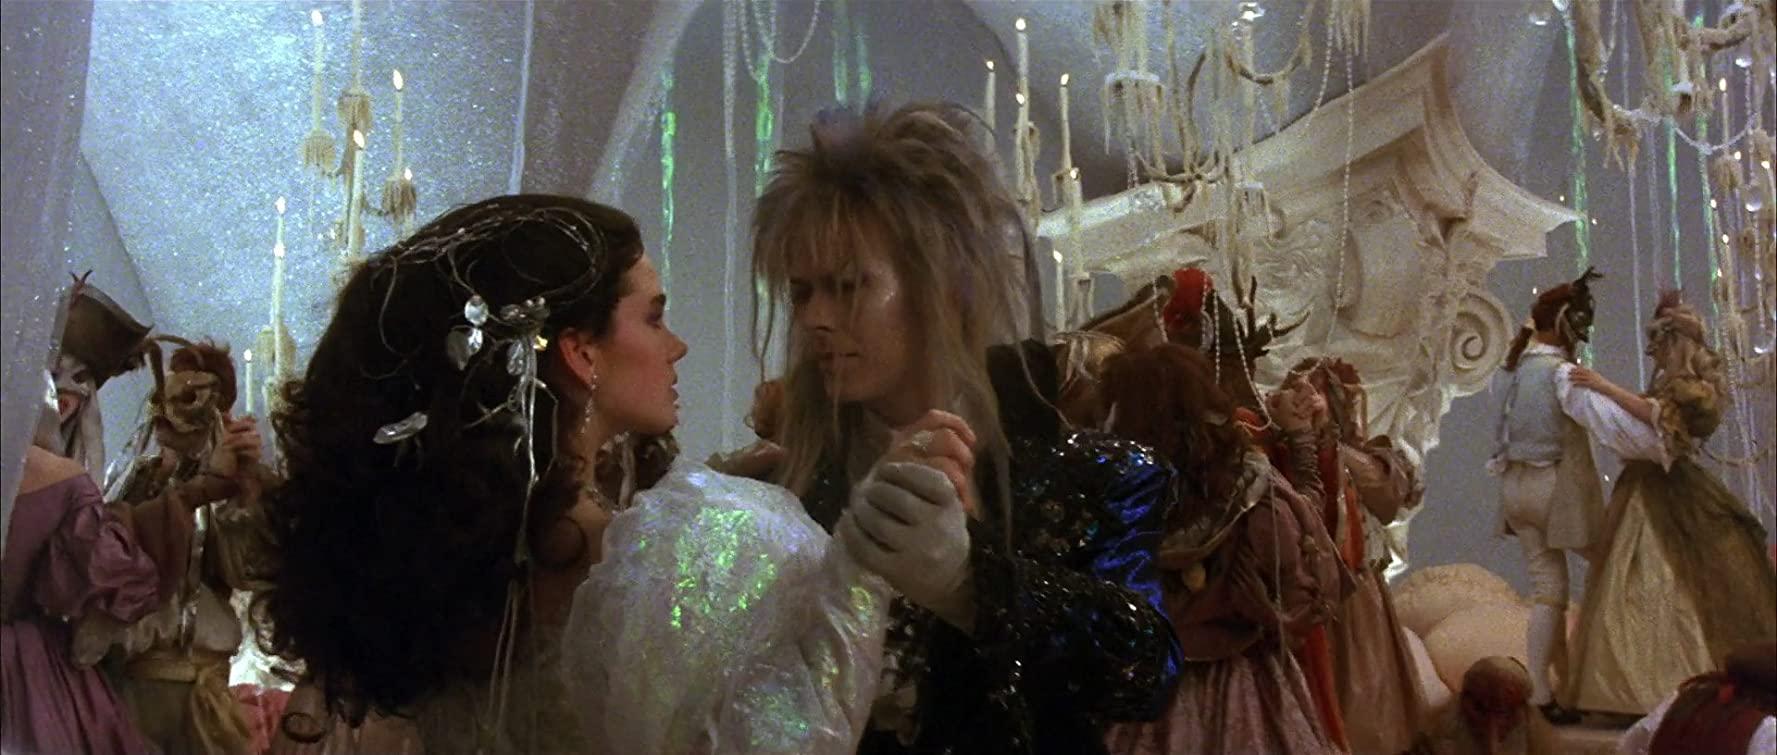 Jennifer Connelly e David Bowie nel film Labyrinth